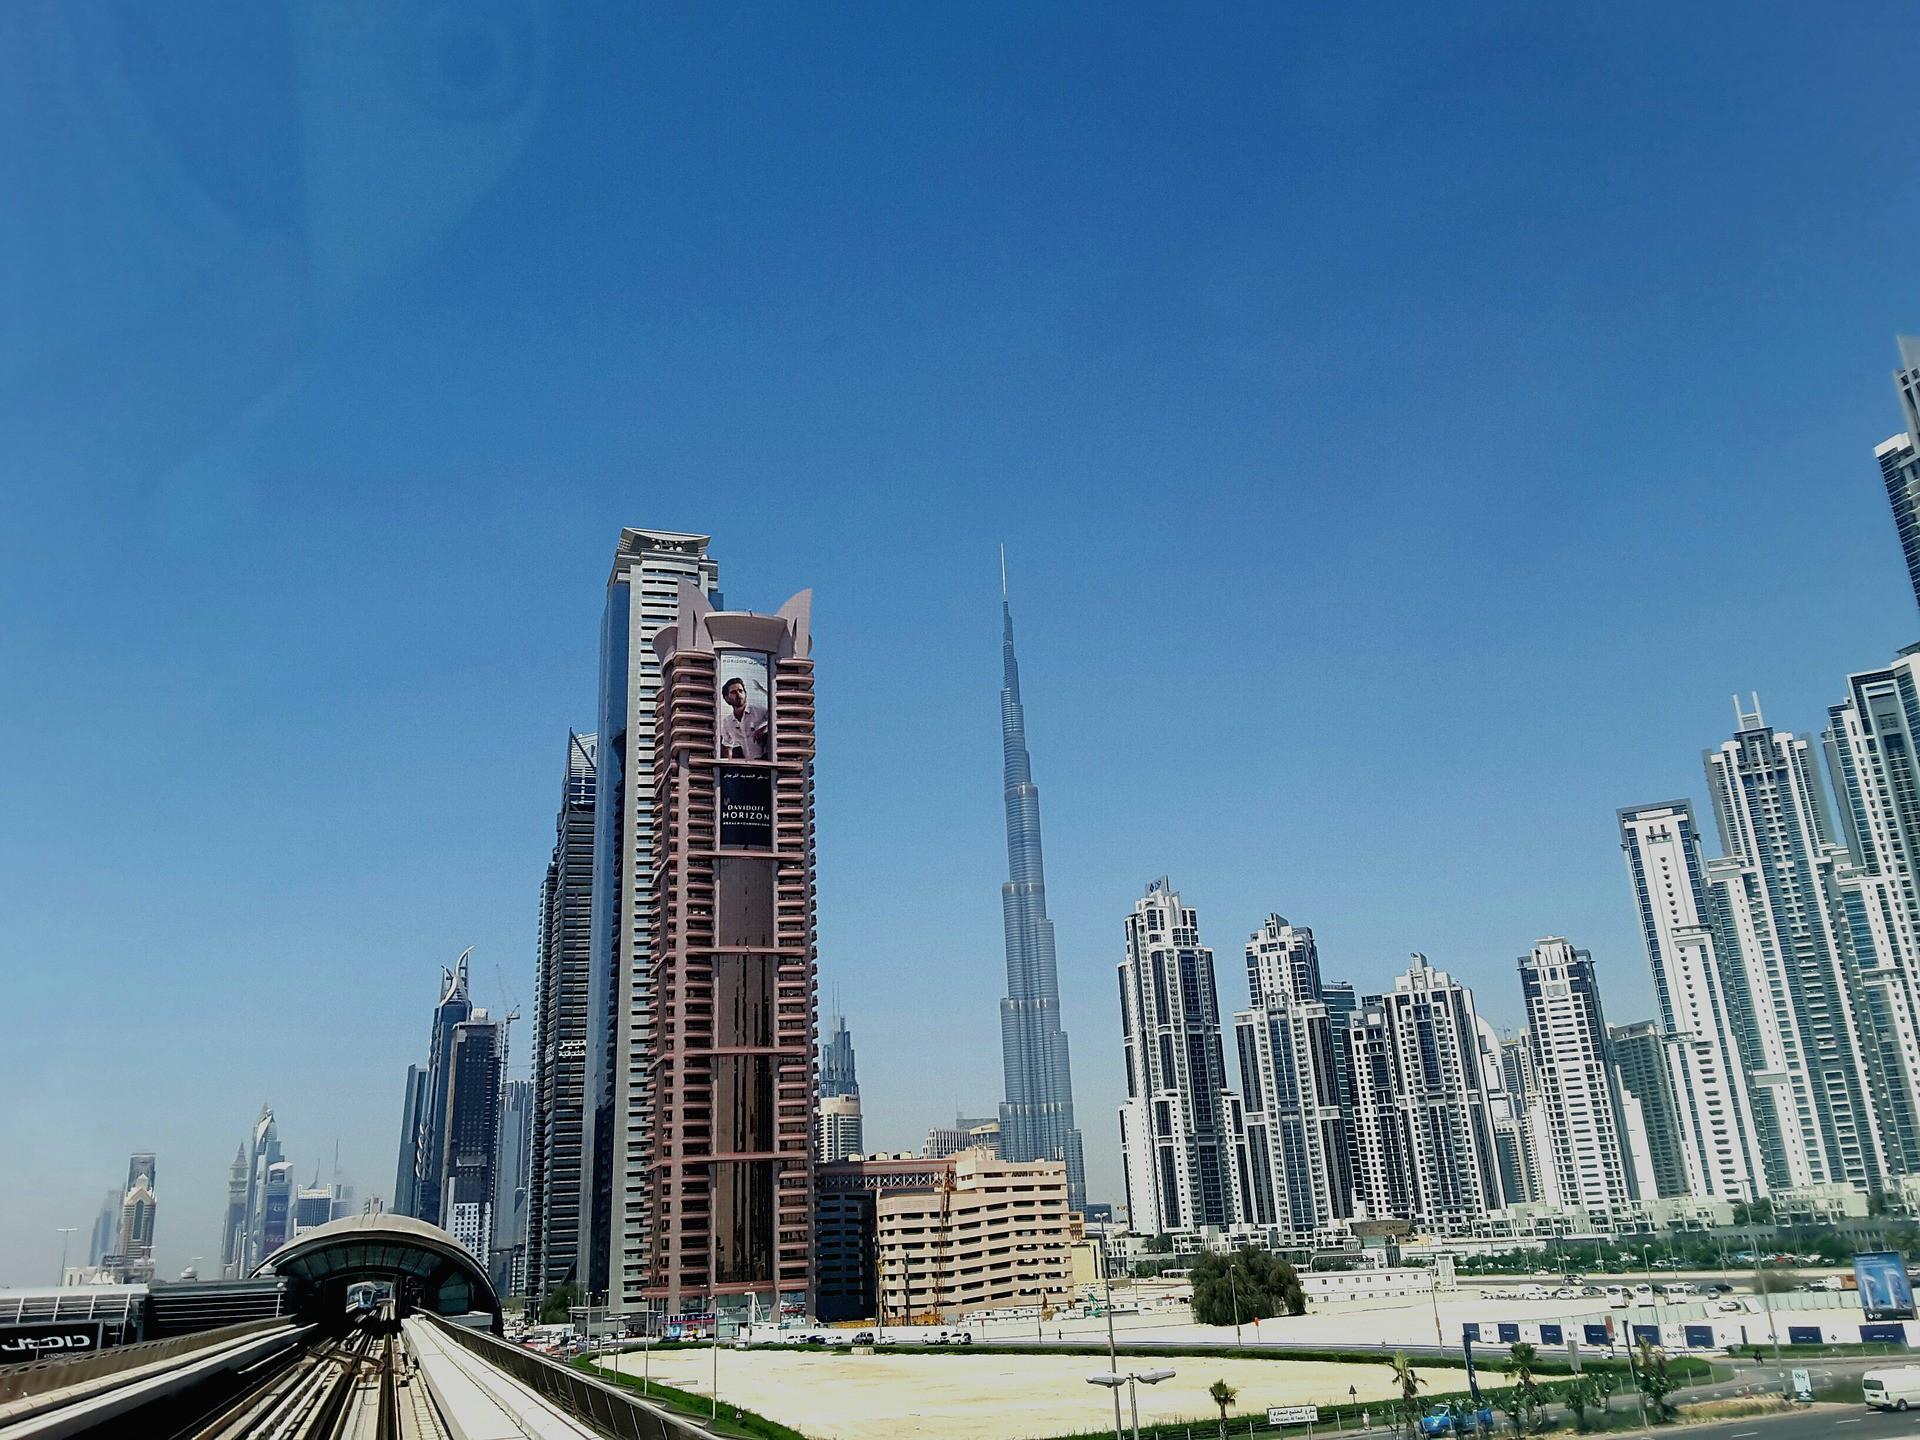 9 Things That Make Dubai A Truly Unique Place